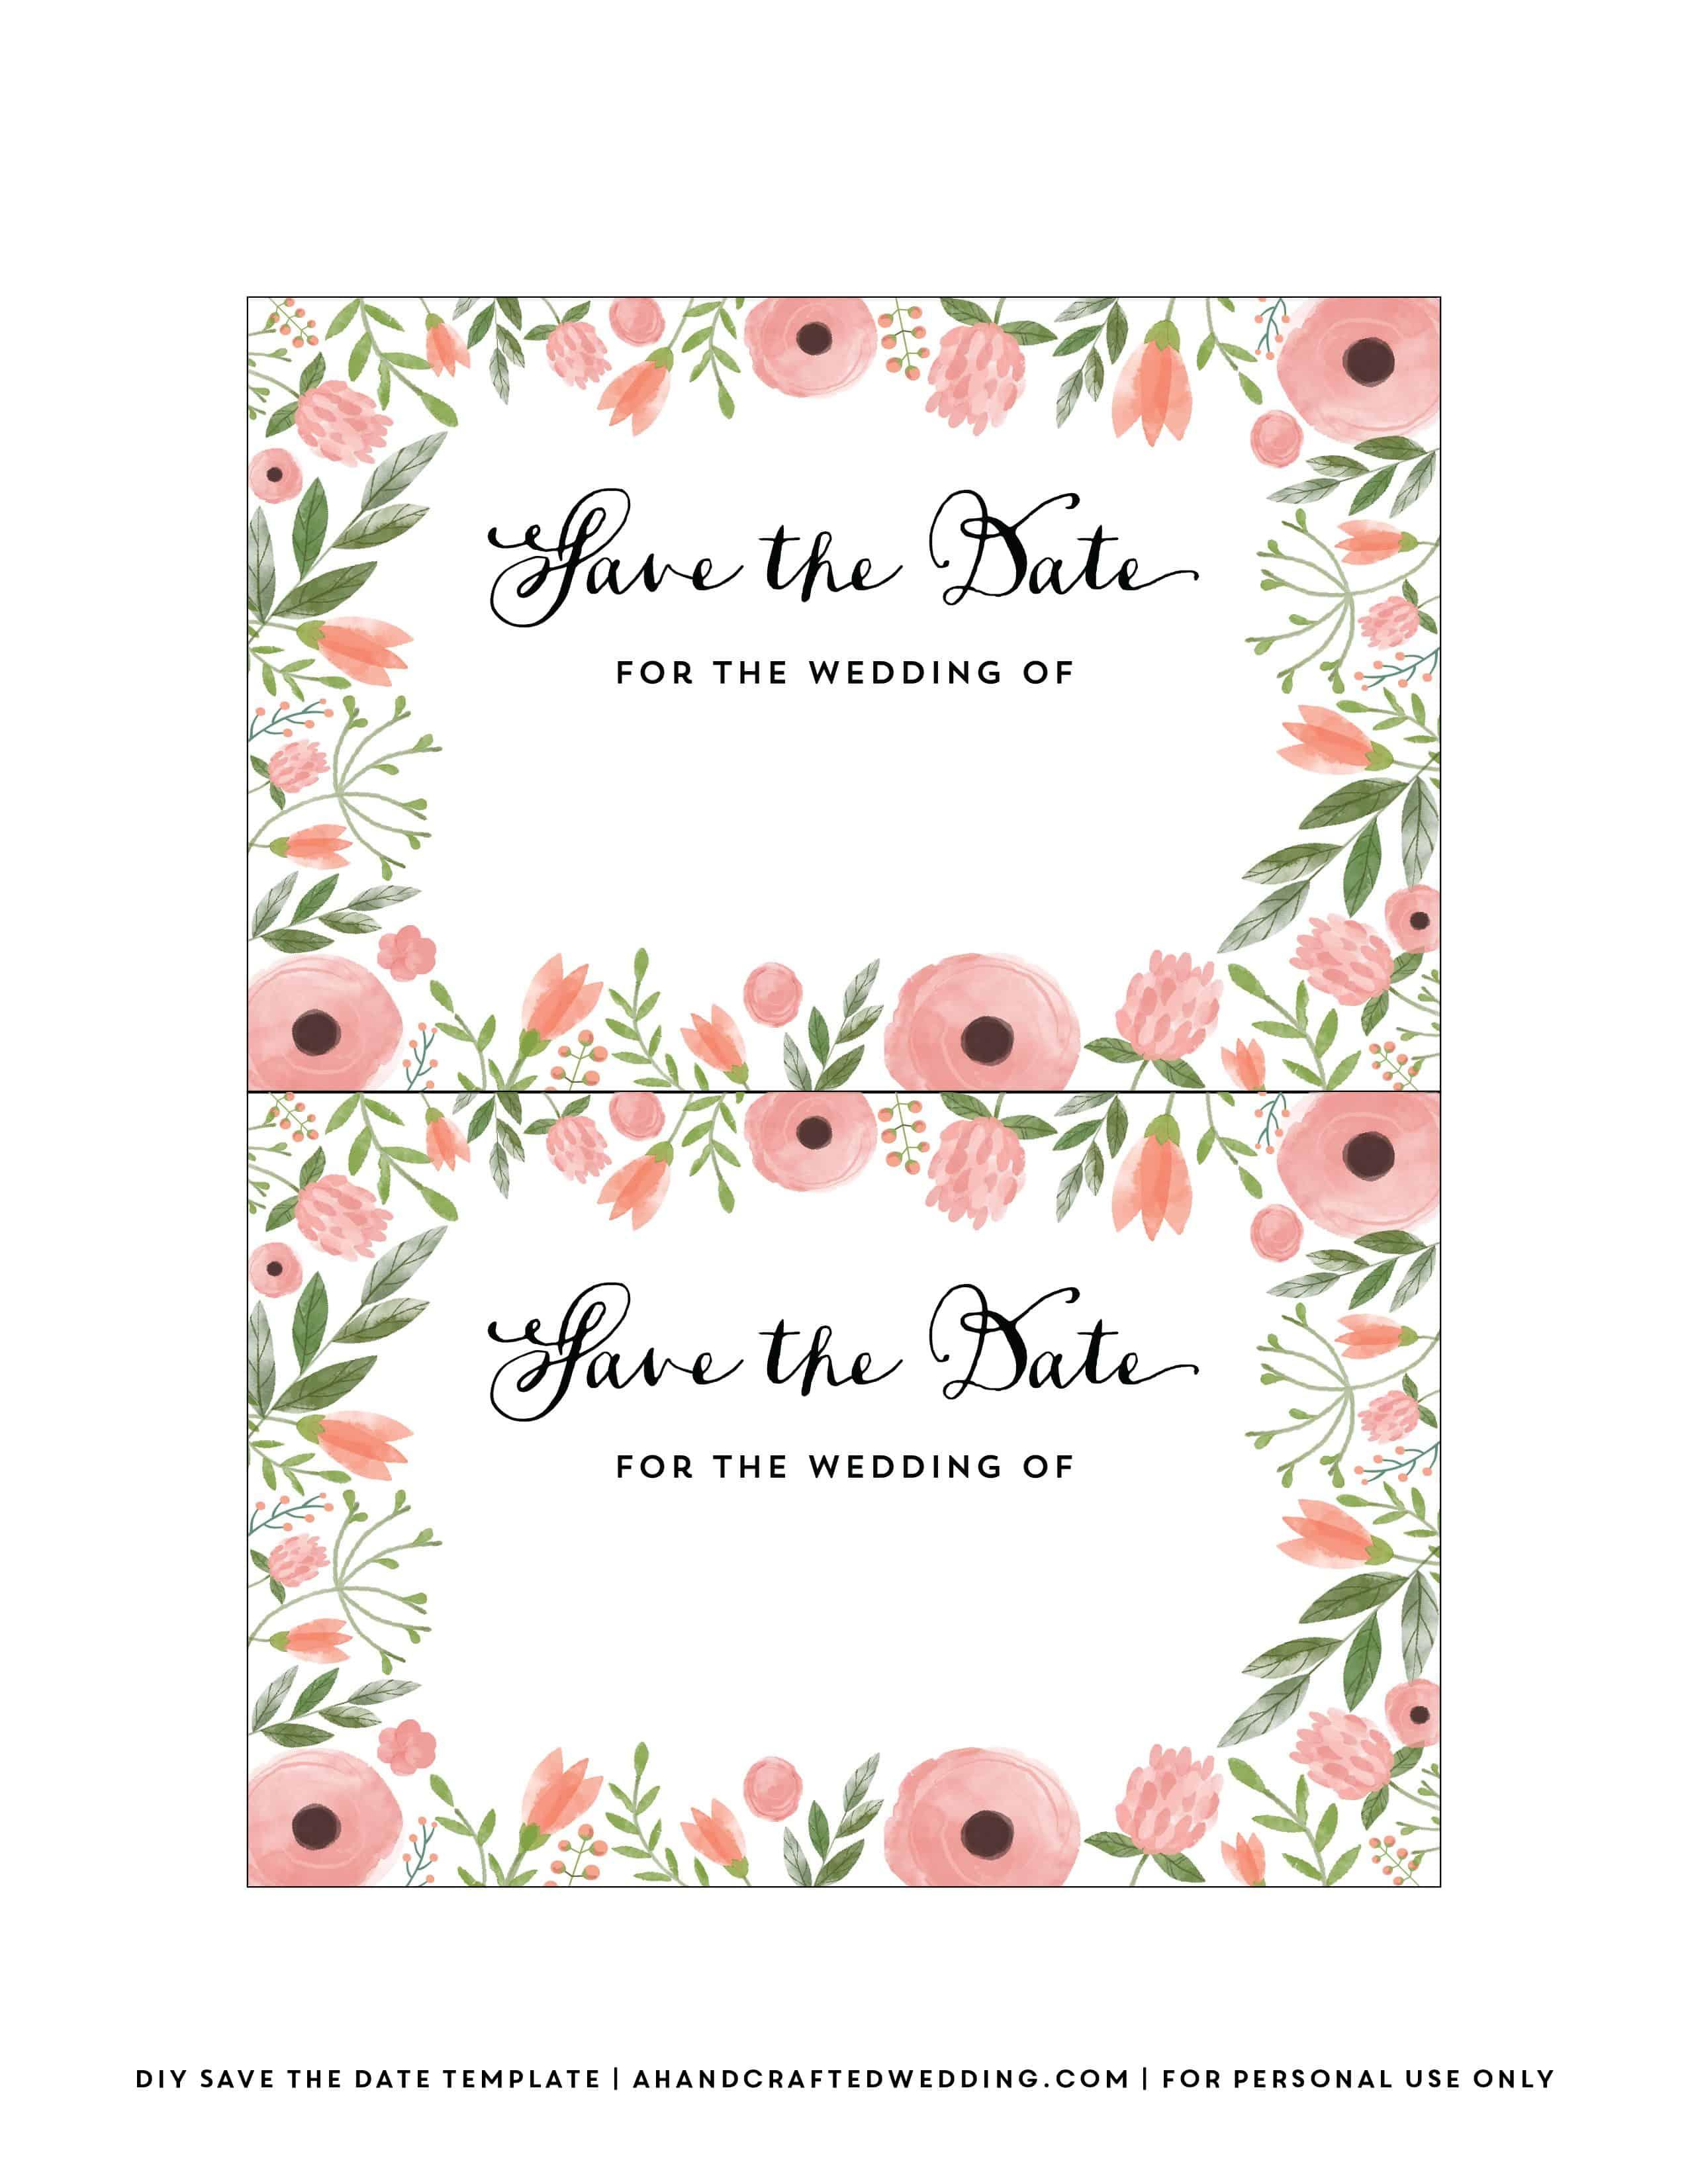 Diy Save The Date Postcard Free Printable | Mountain Modern Life - Free Printable Save The Date Invitation Templates